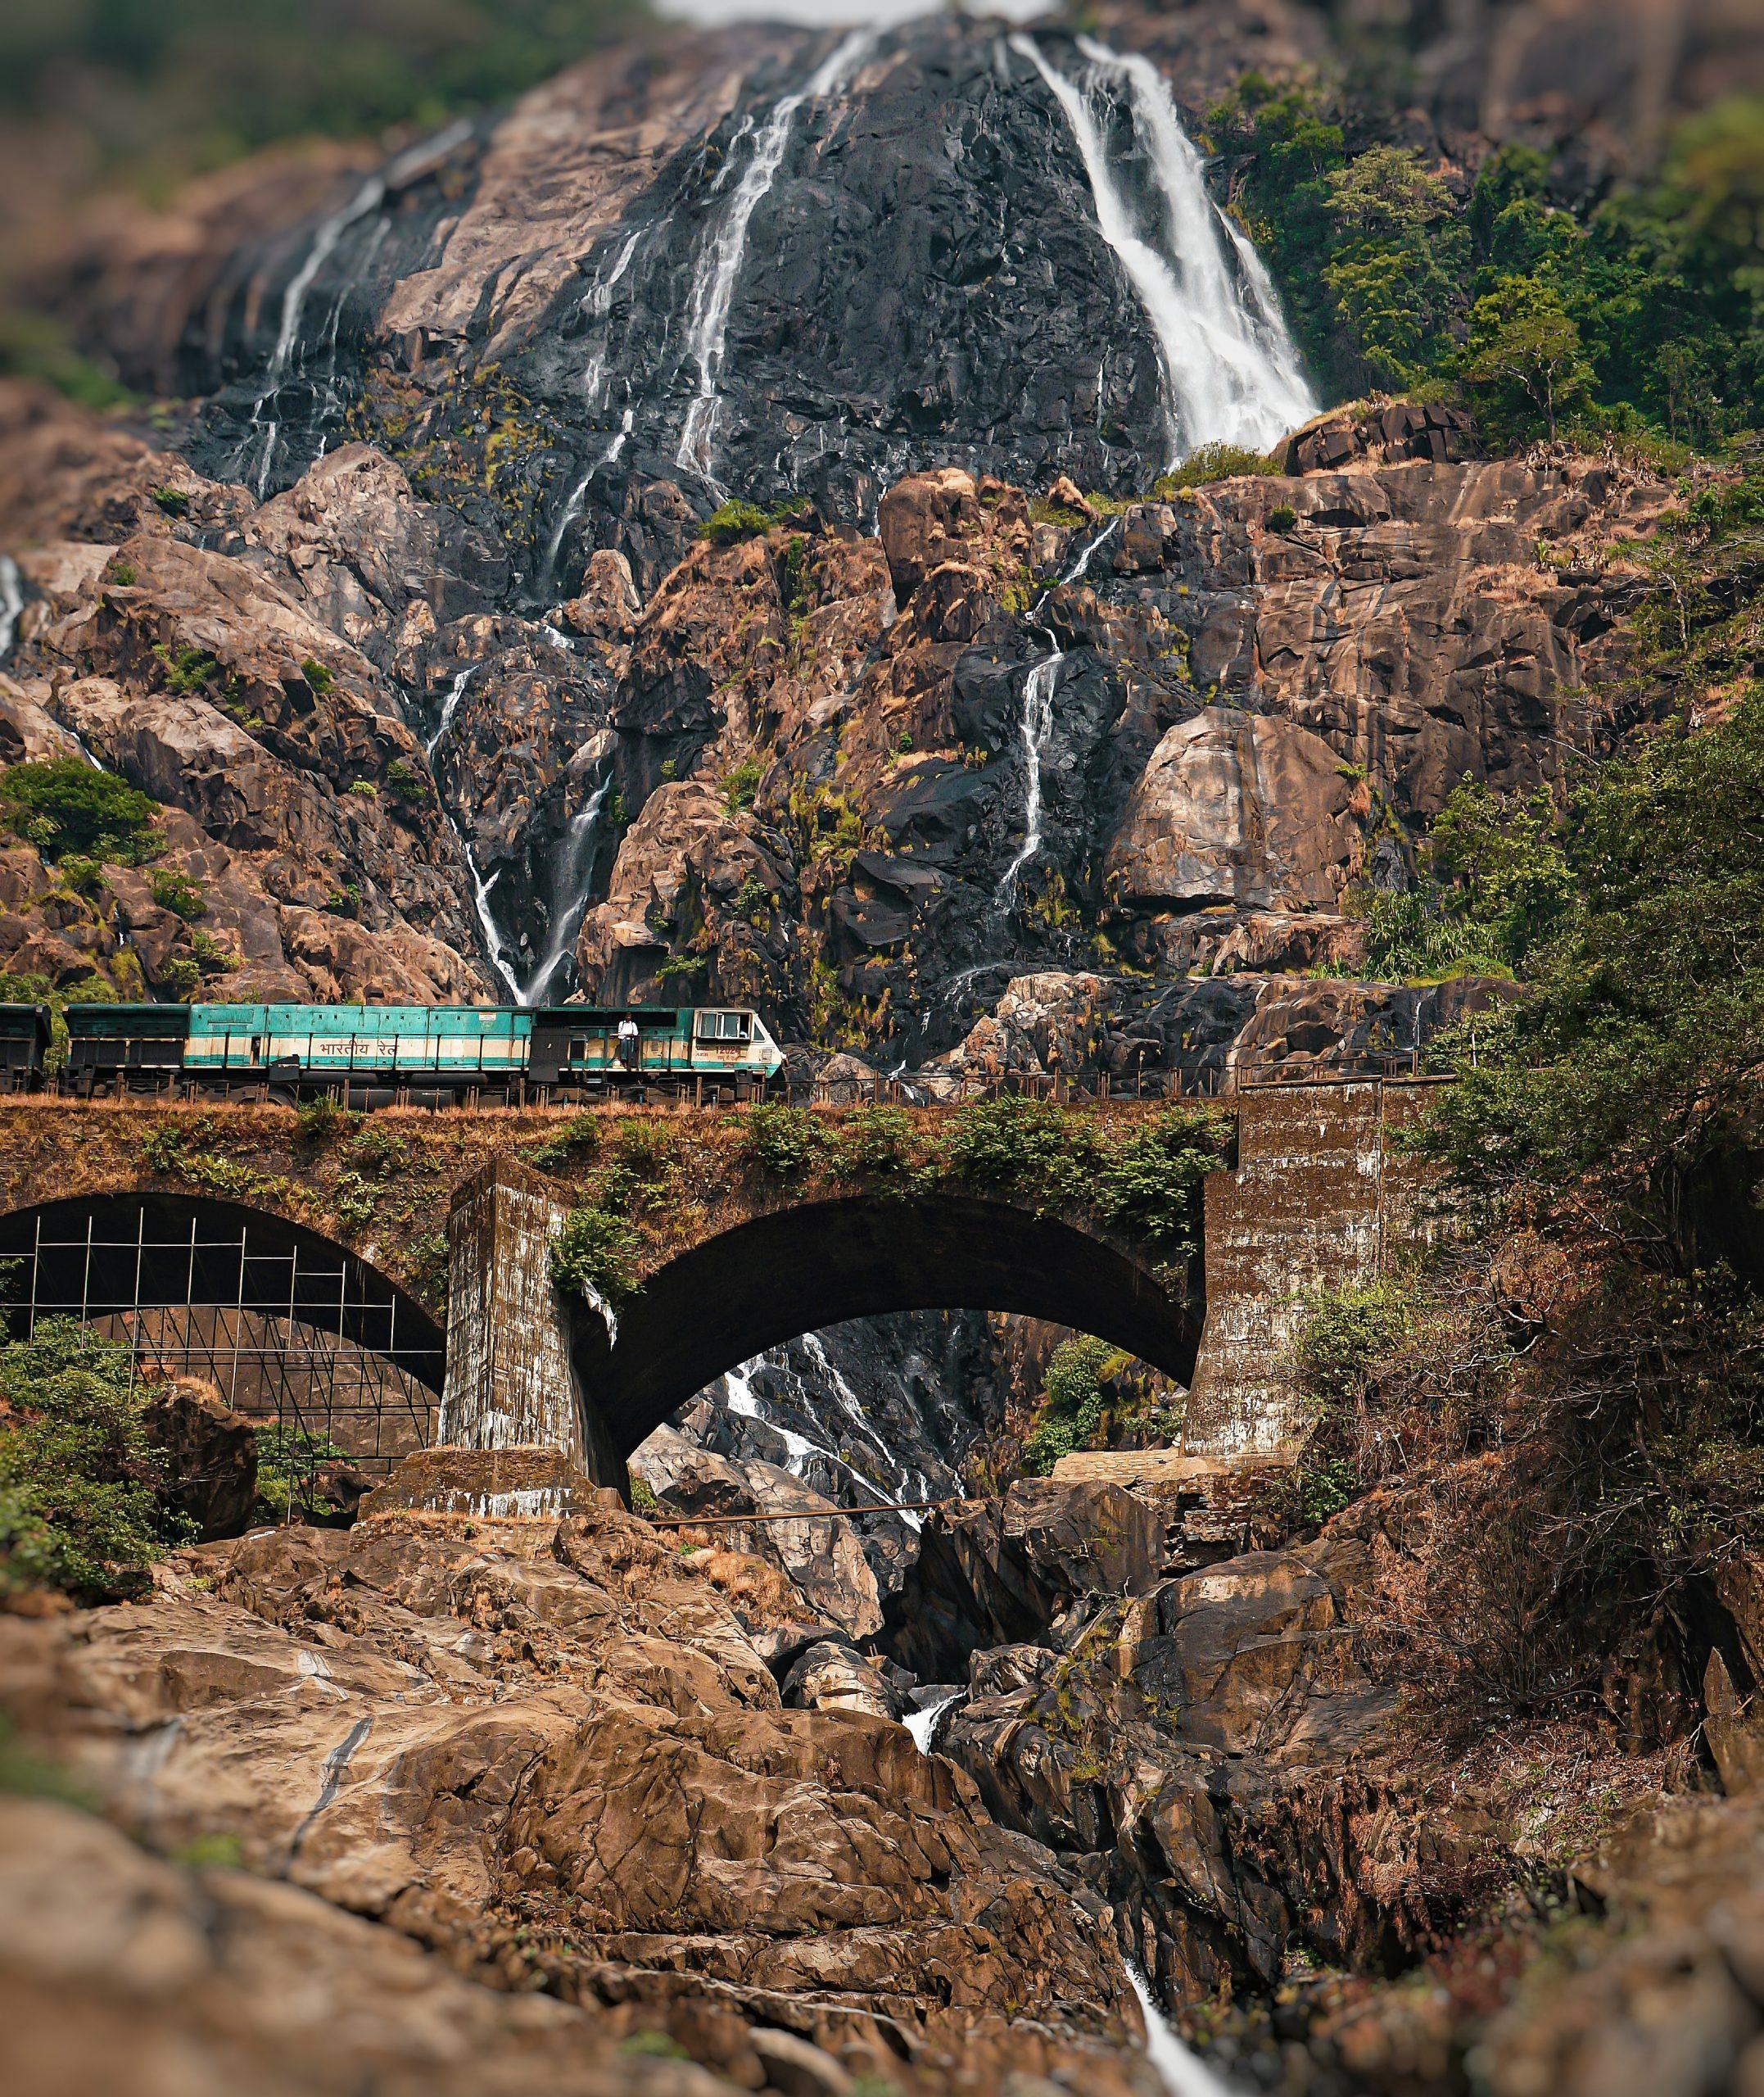 railway track going through waterfalls